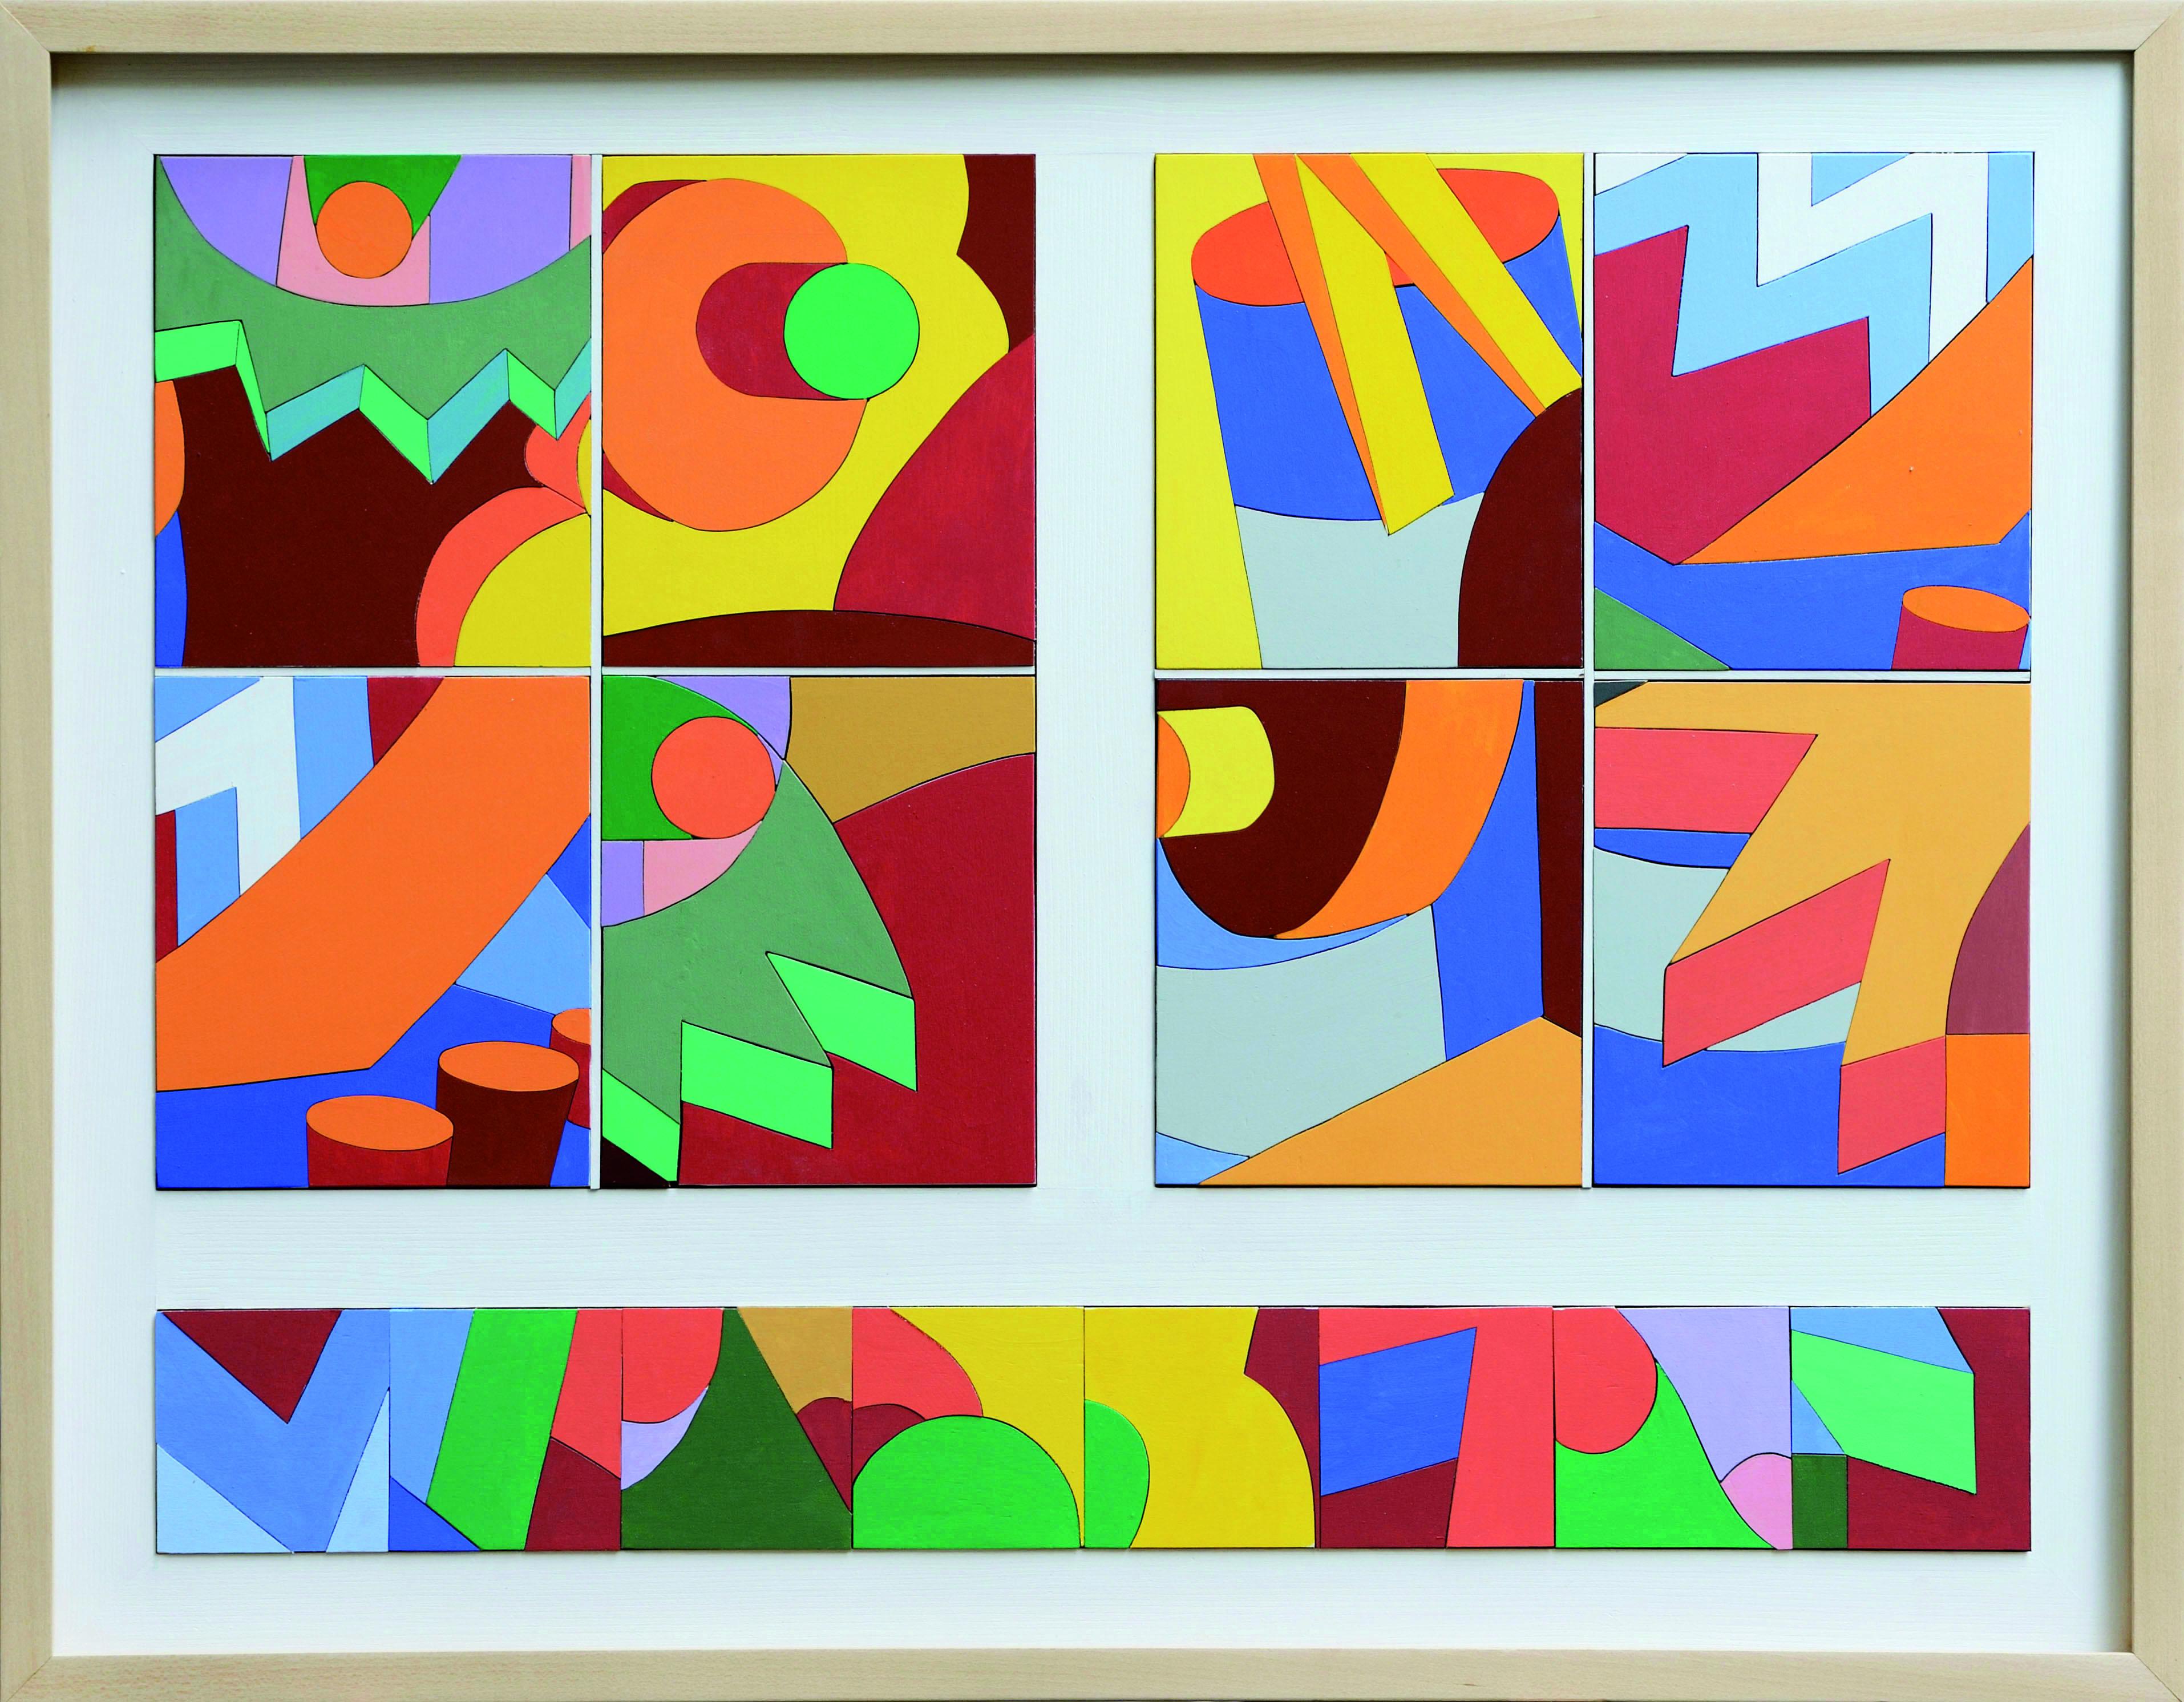 Frammenti, 2012